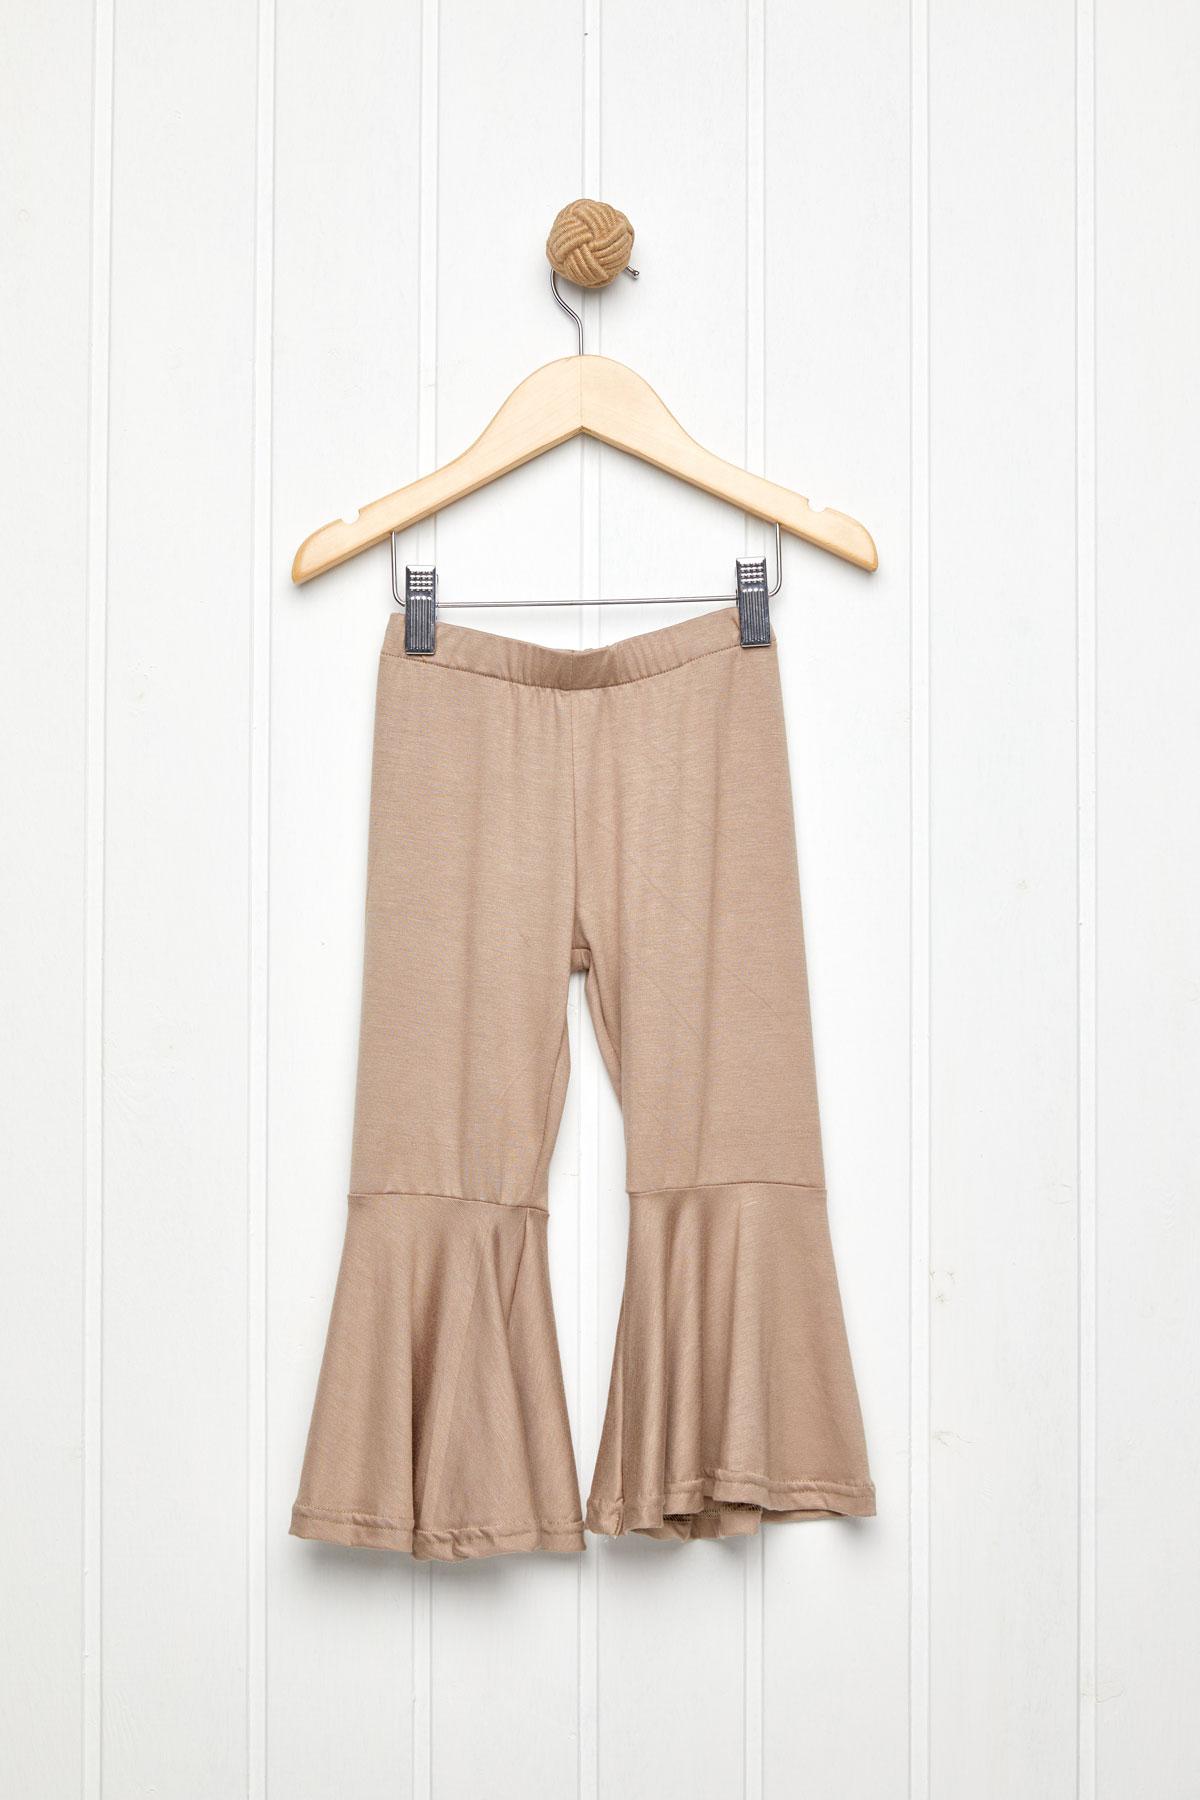 60's παντελόνι ελαστικό σοκολά